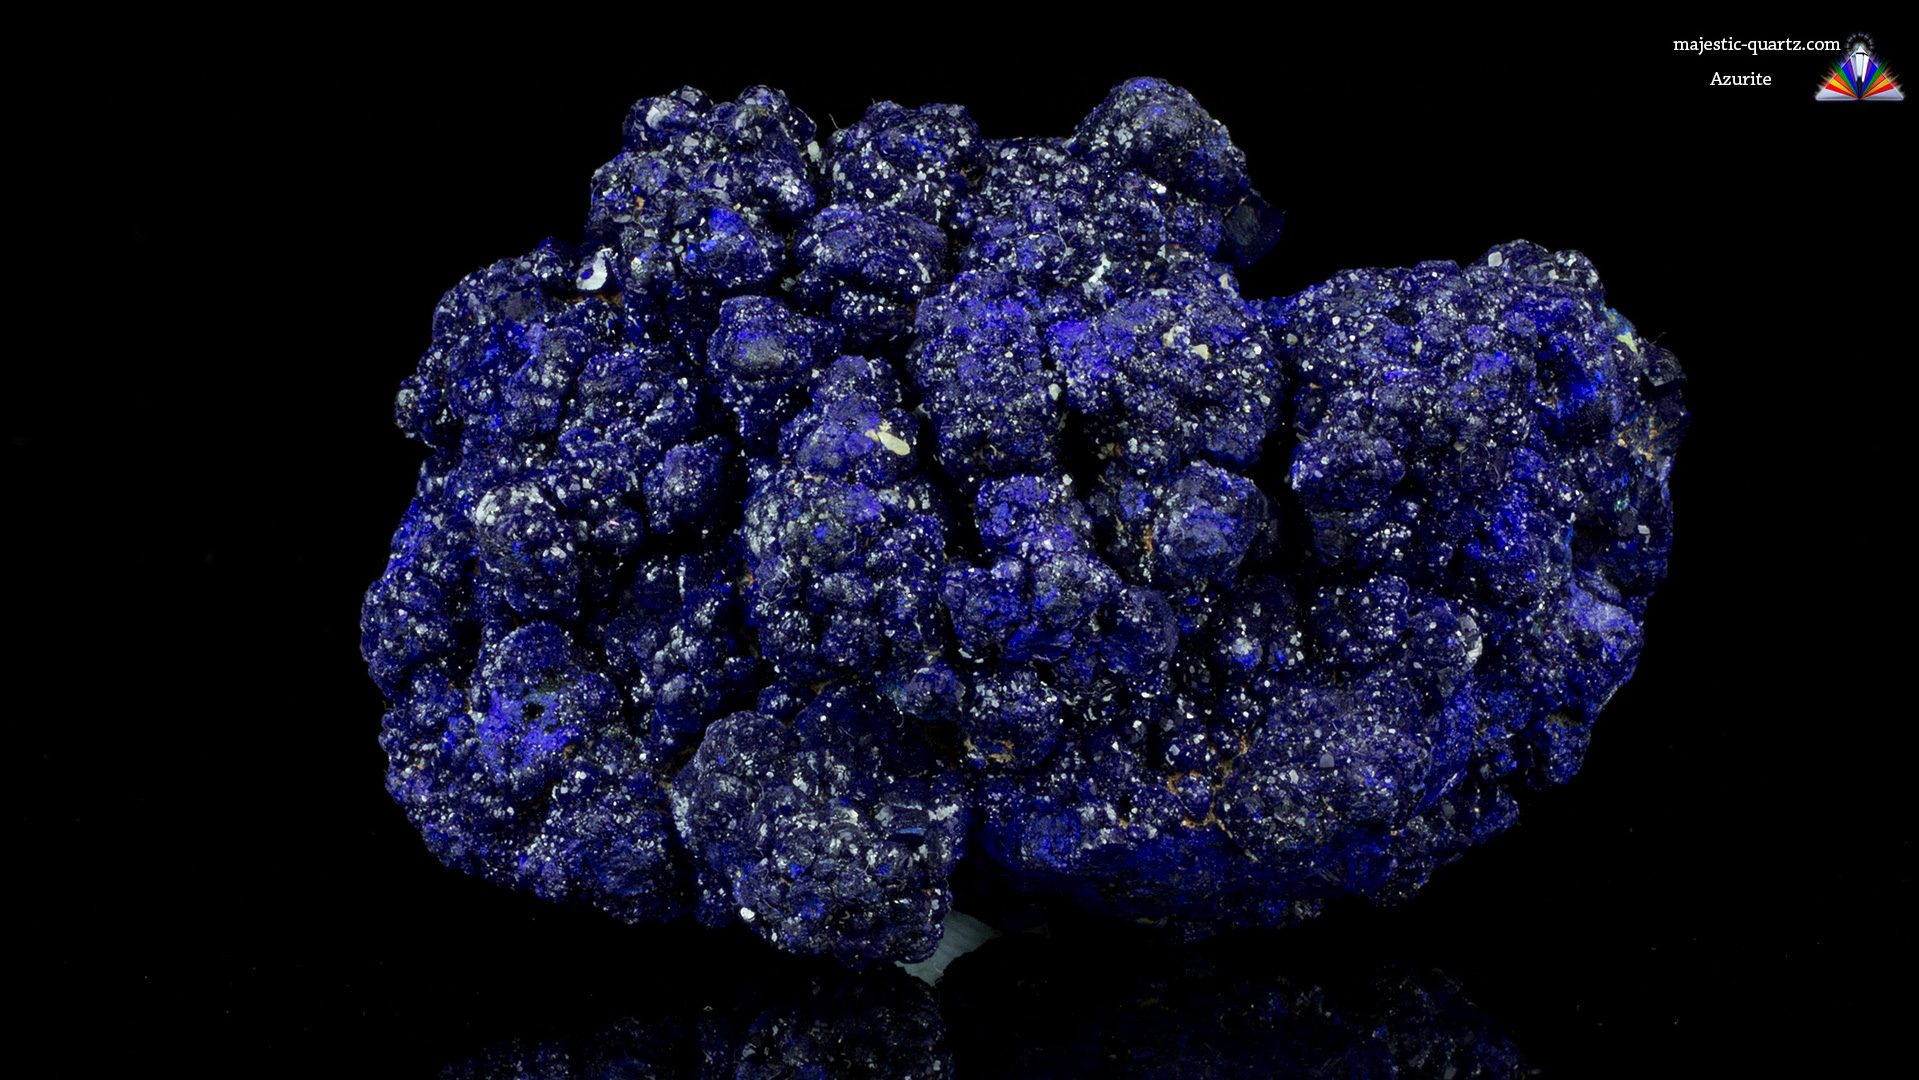 Azurite Crystal Specimen - Mineral Specimen